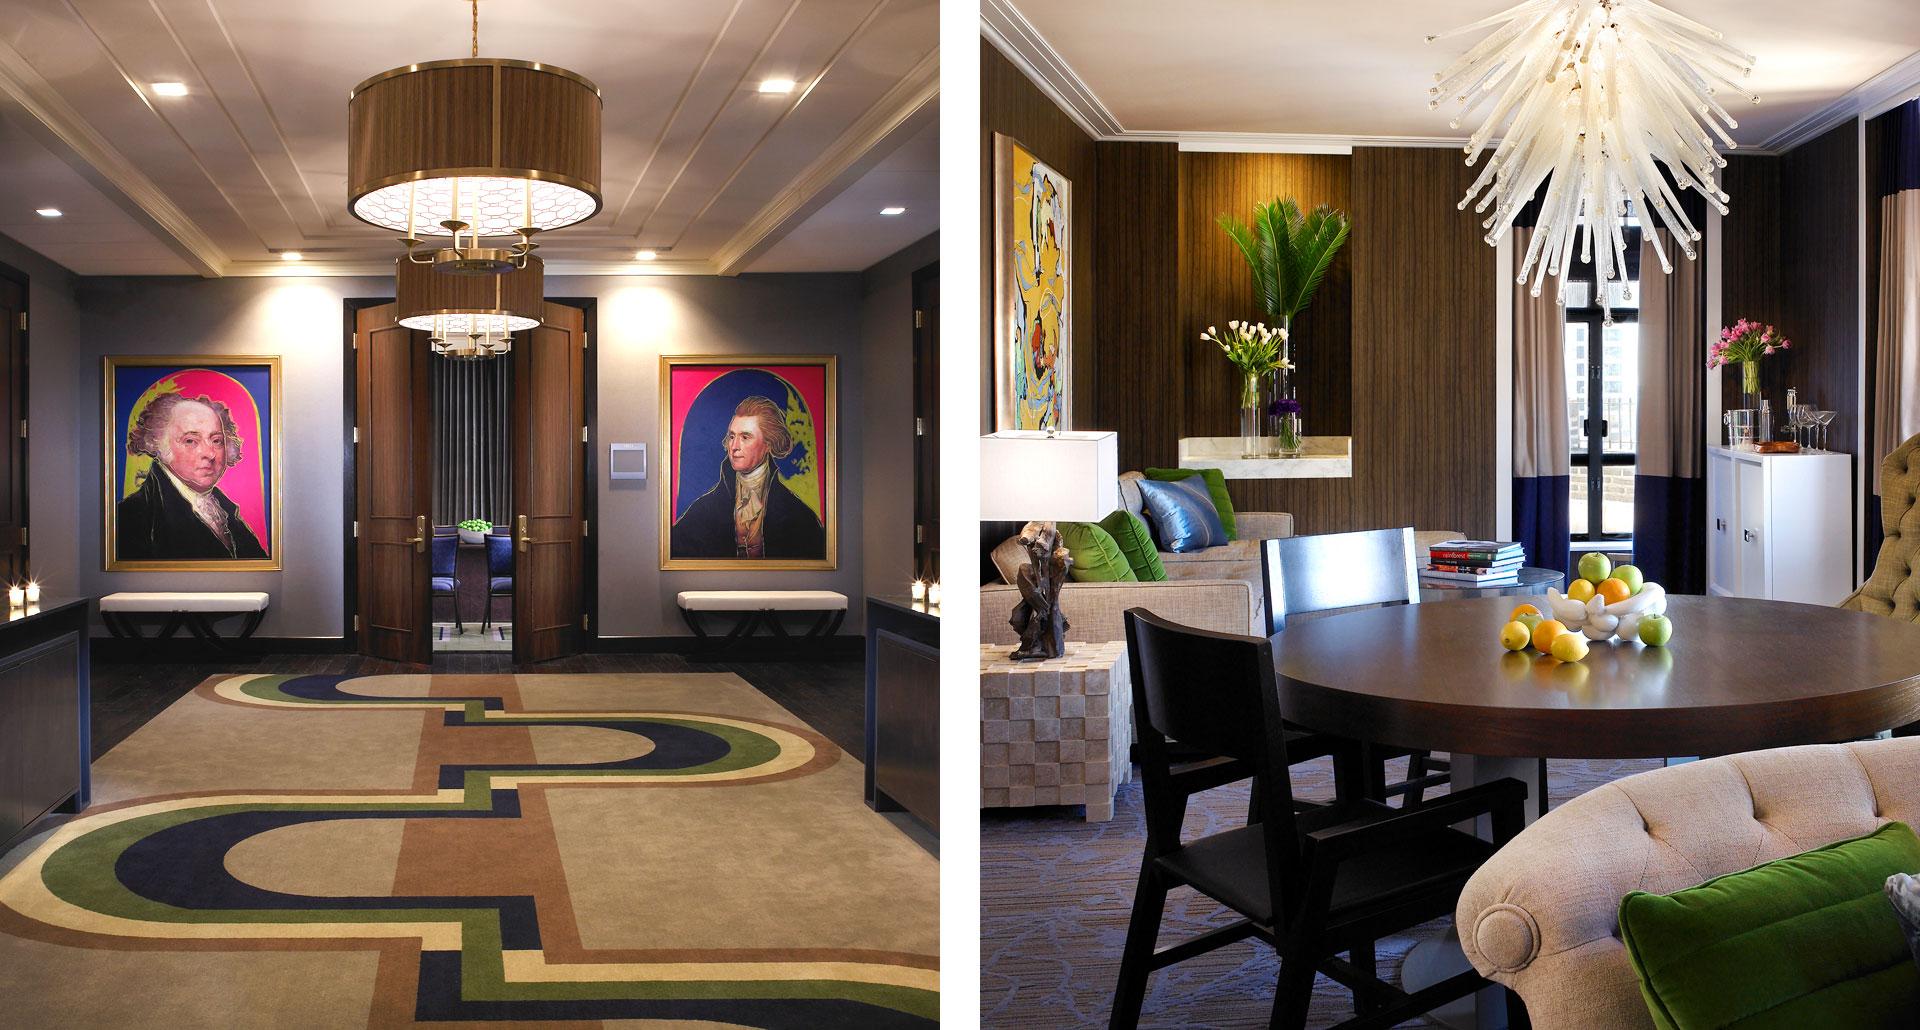 Hotel Palomar Philadelphia - boutique hotel in Philadelphia